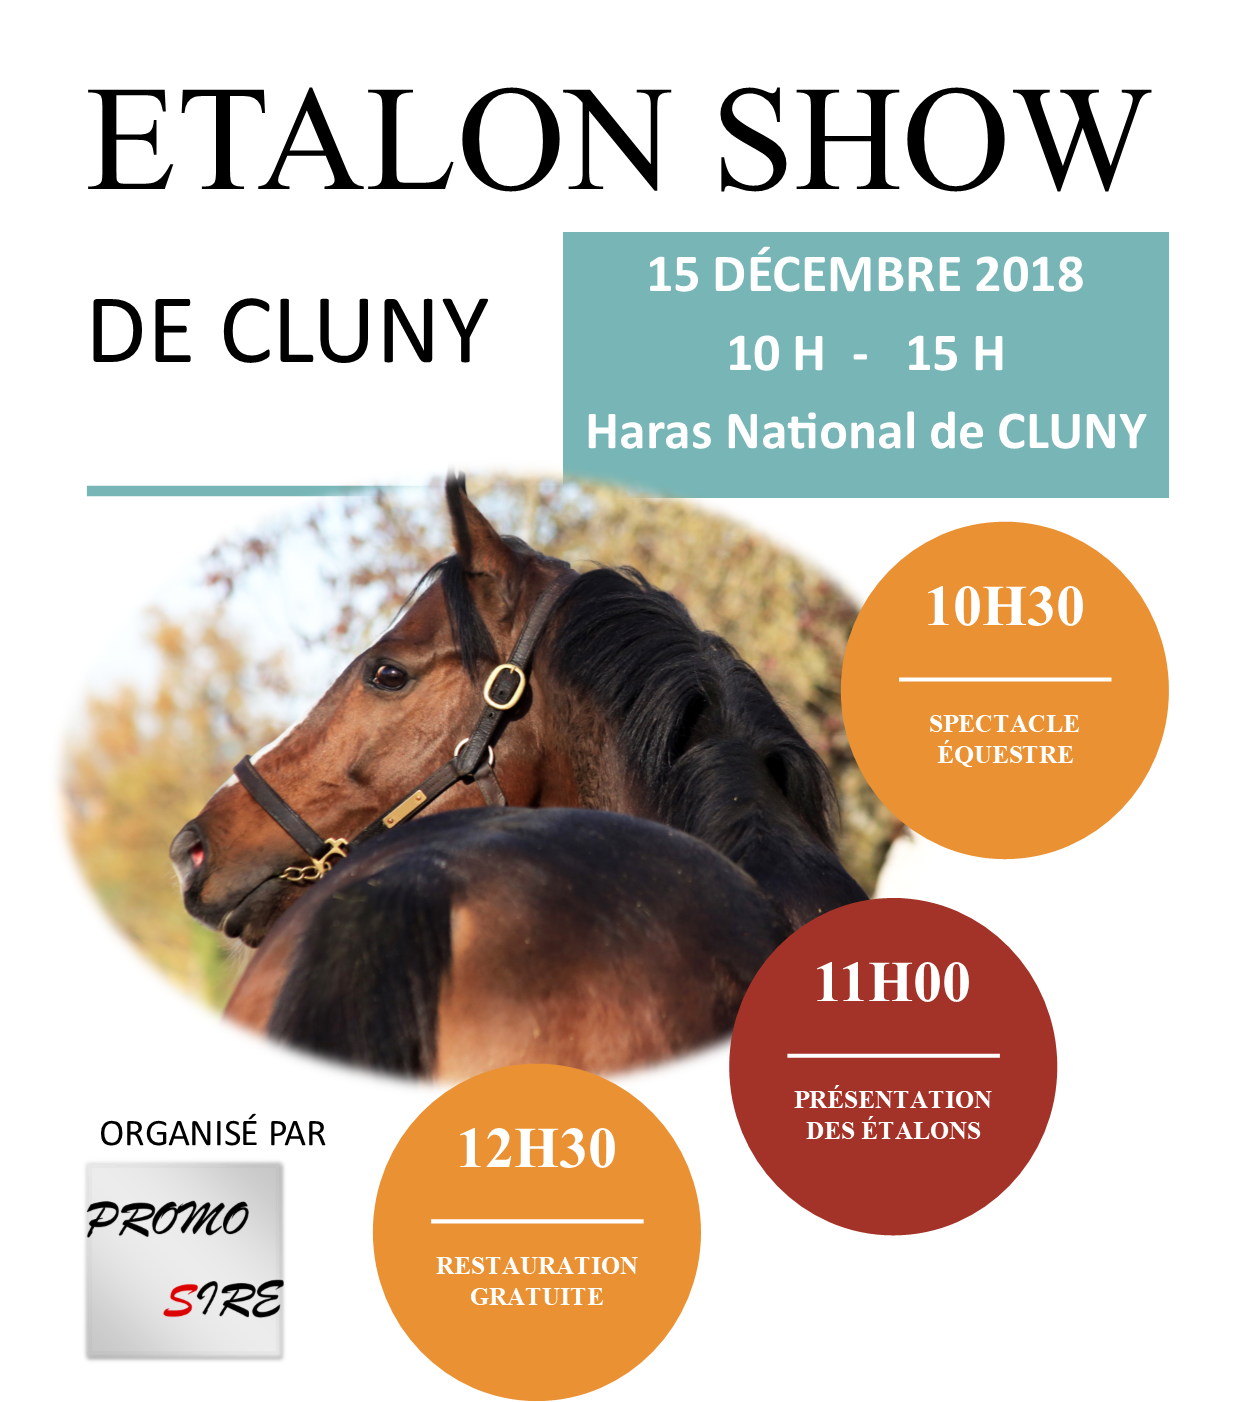 Etalon Show à Cluny